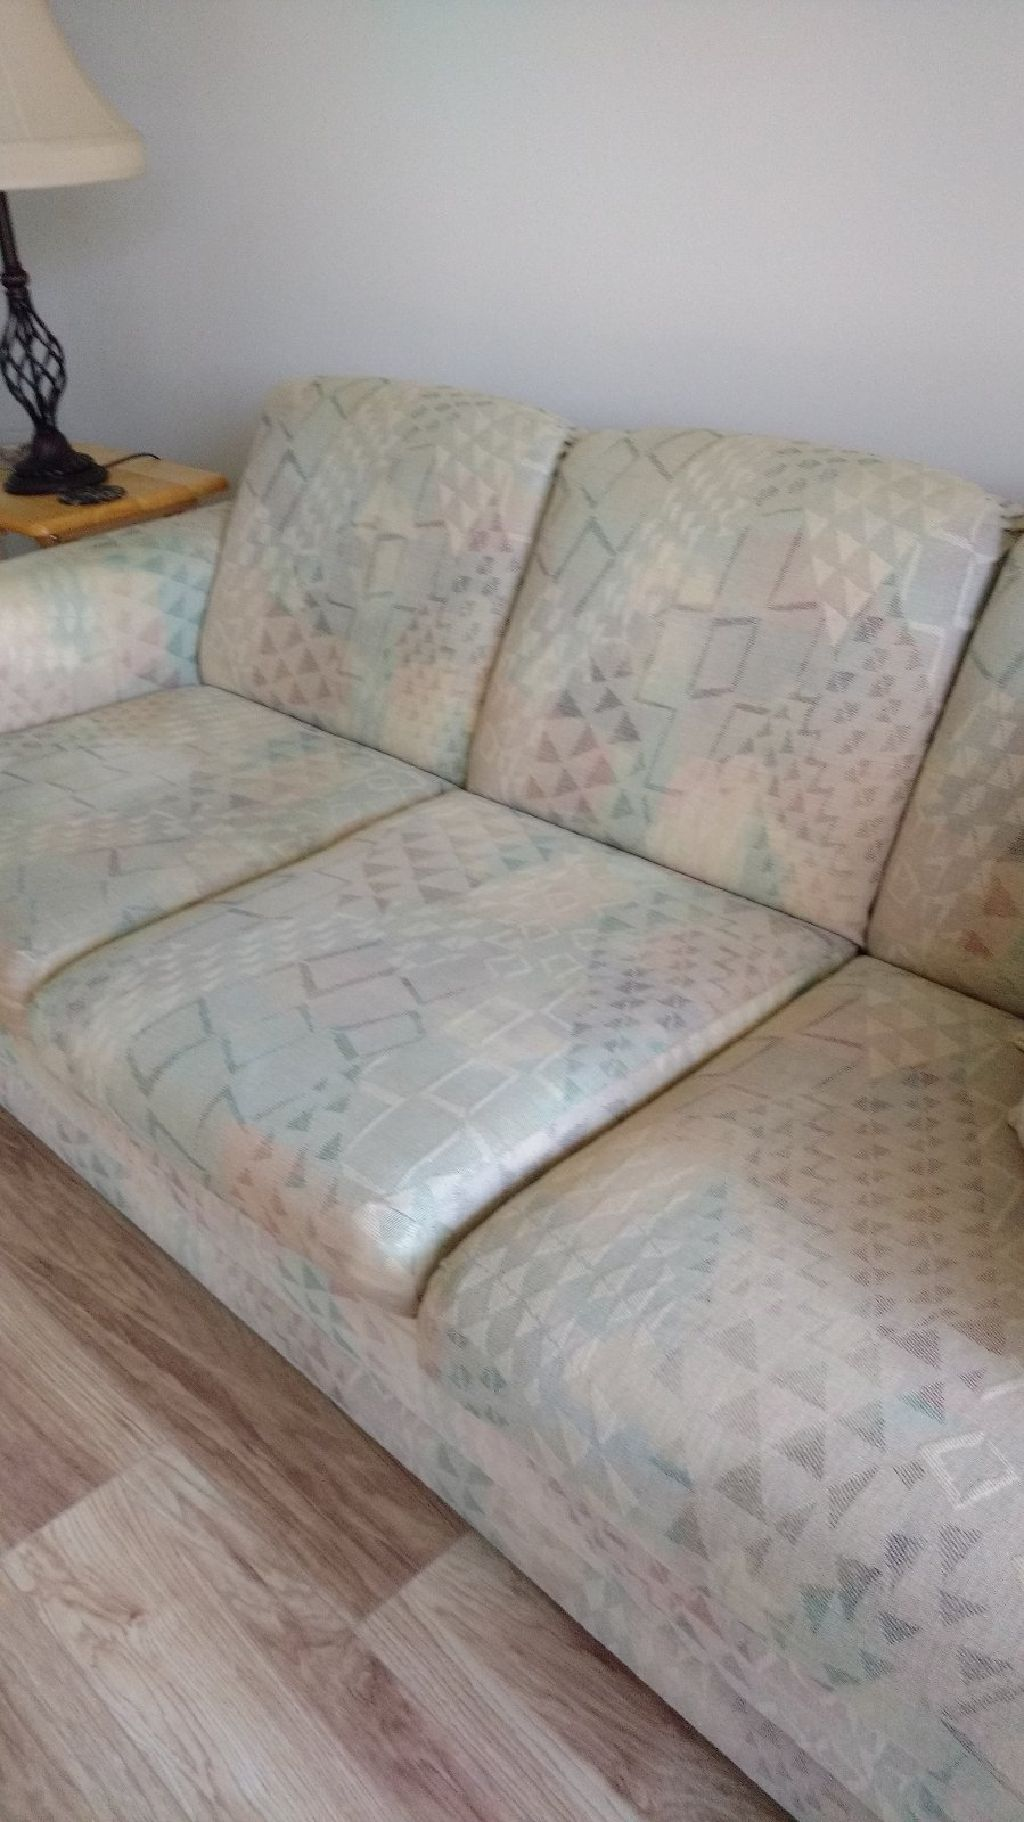 Los Angeles Free Lazy Boy Loveseat Sleeper Sofa Love Seat